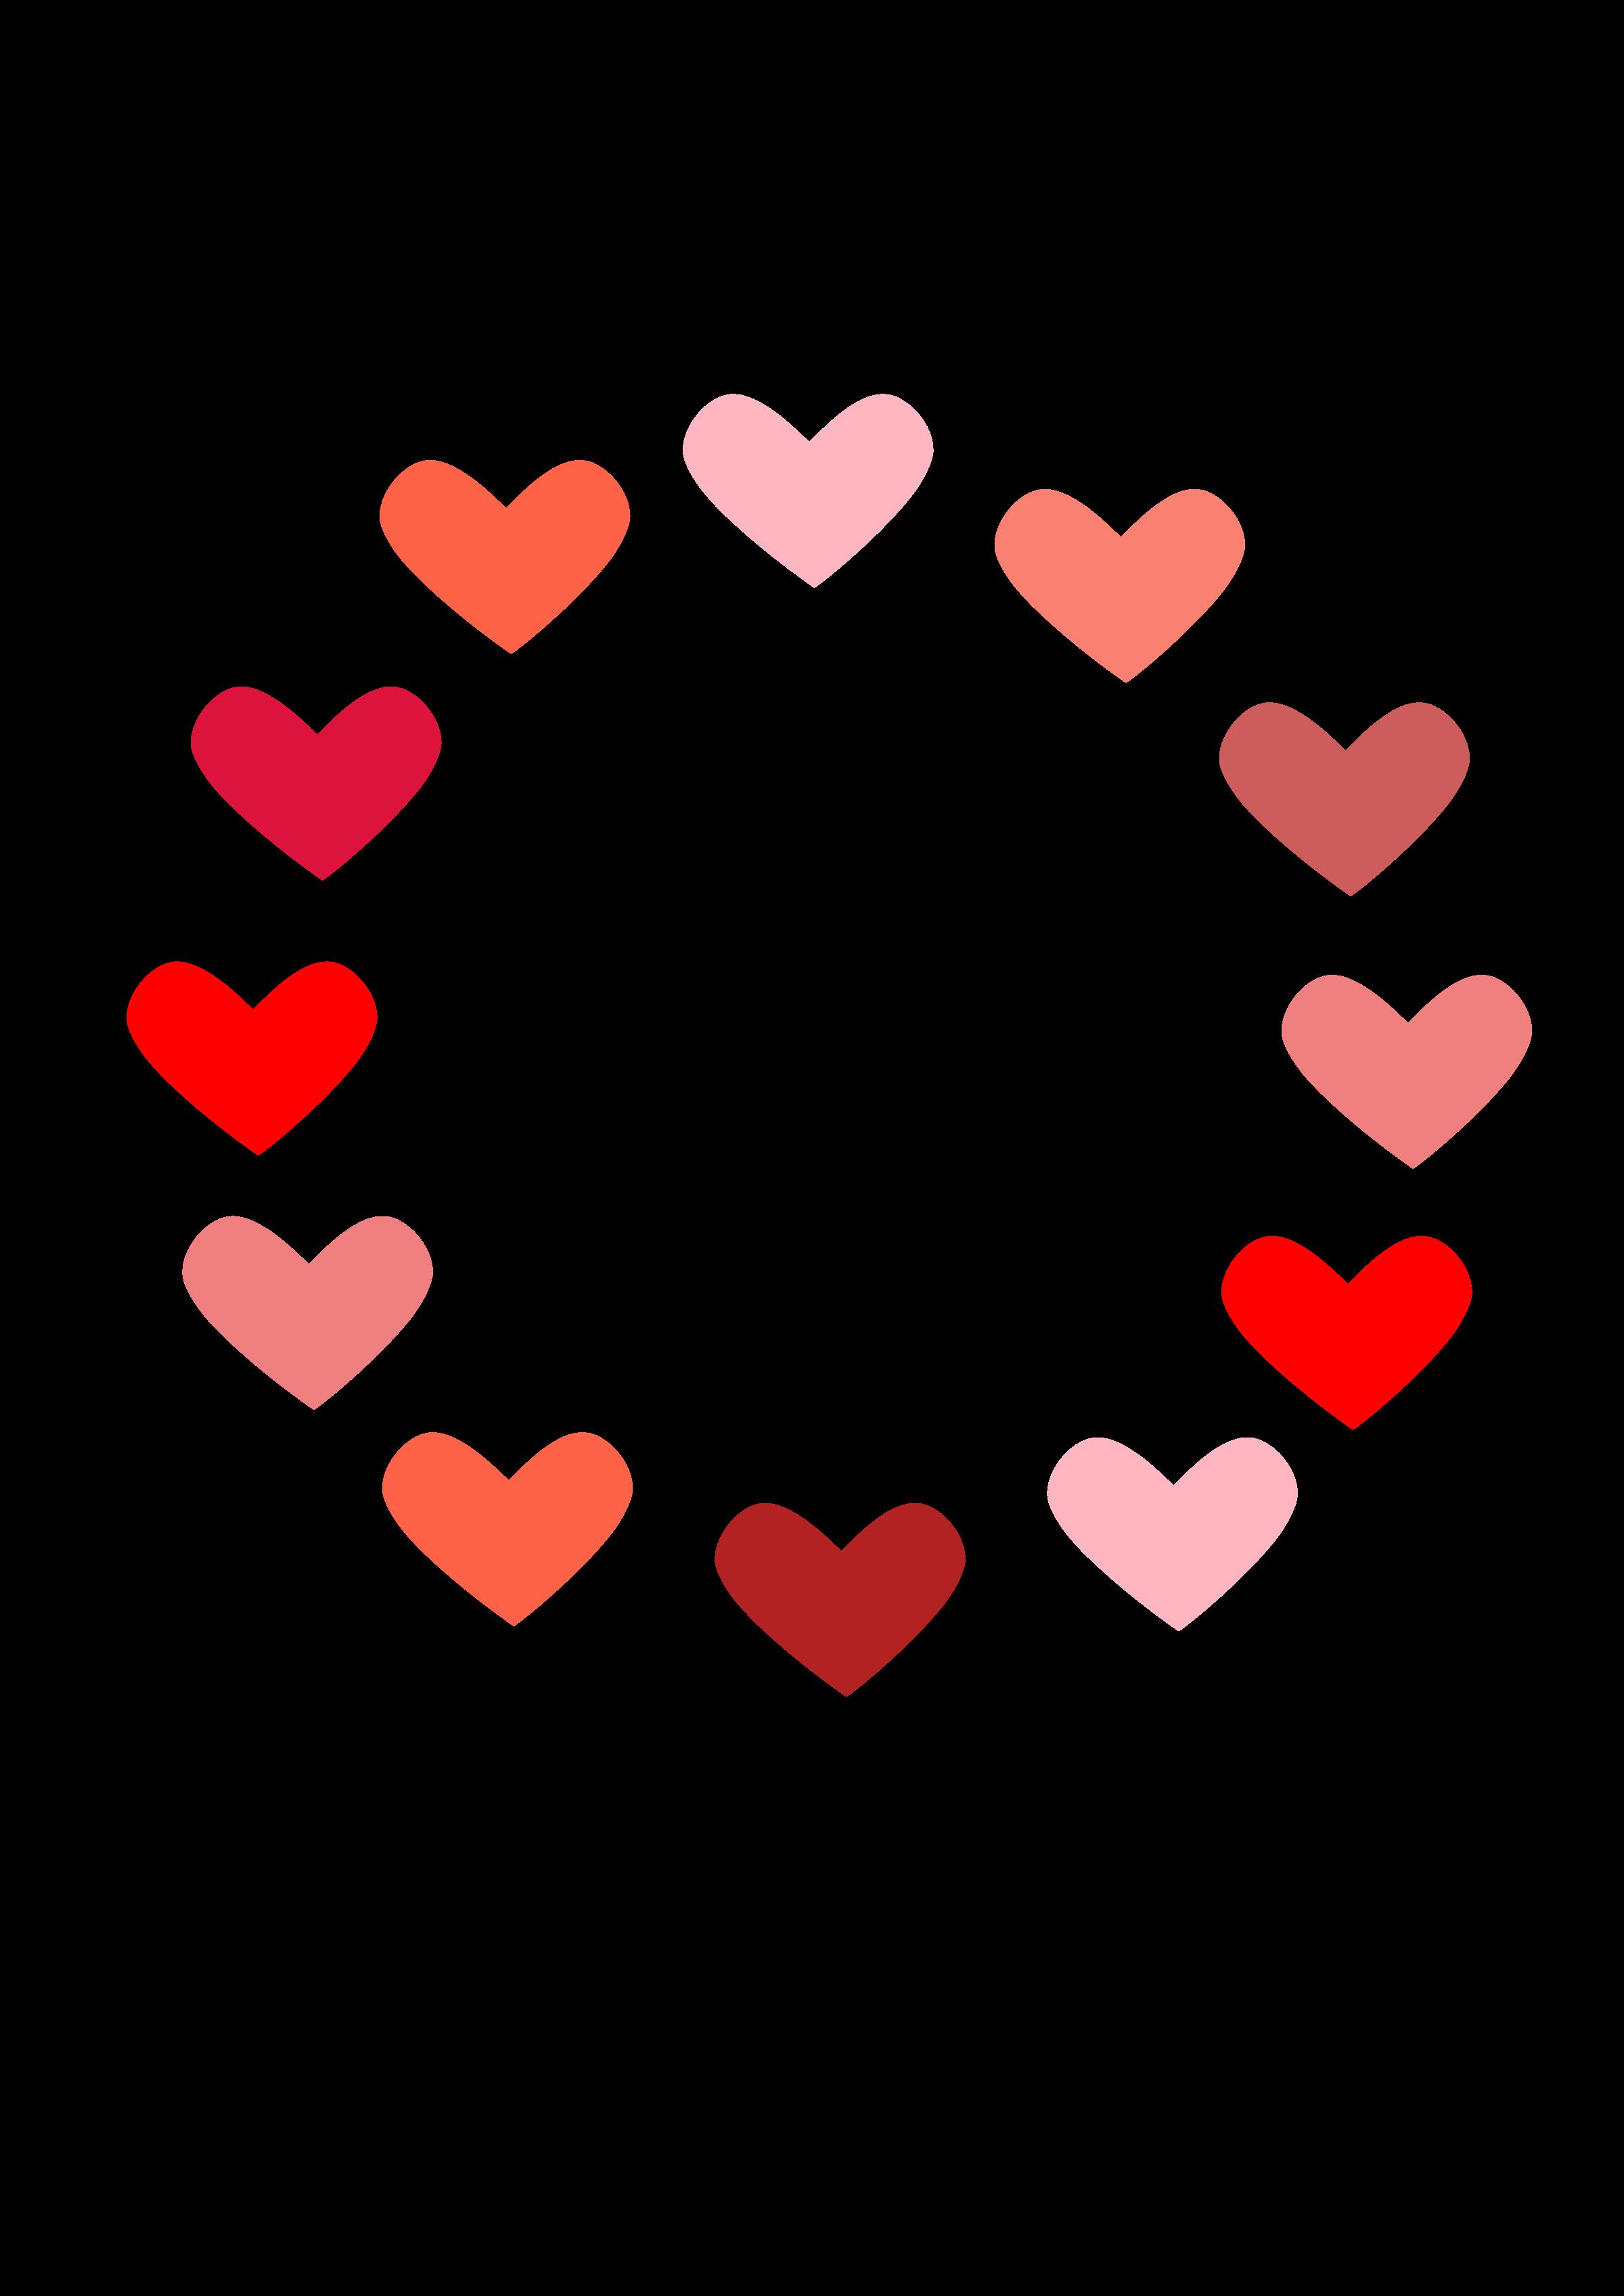 Of love big image. Circle clipart pink